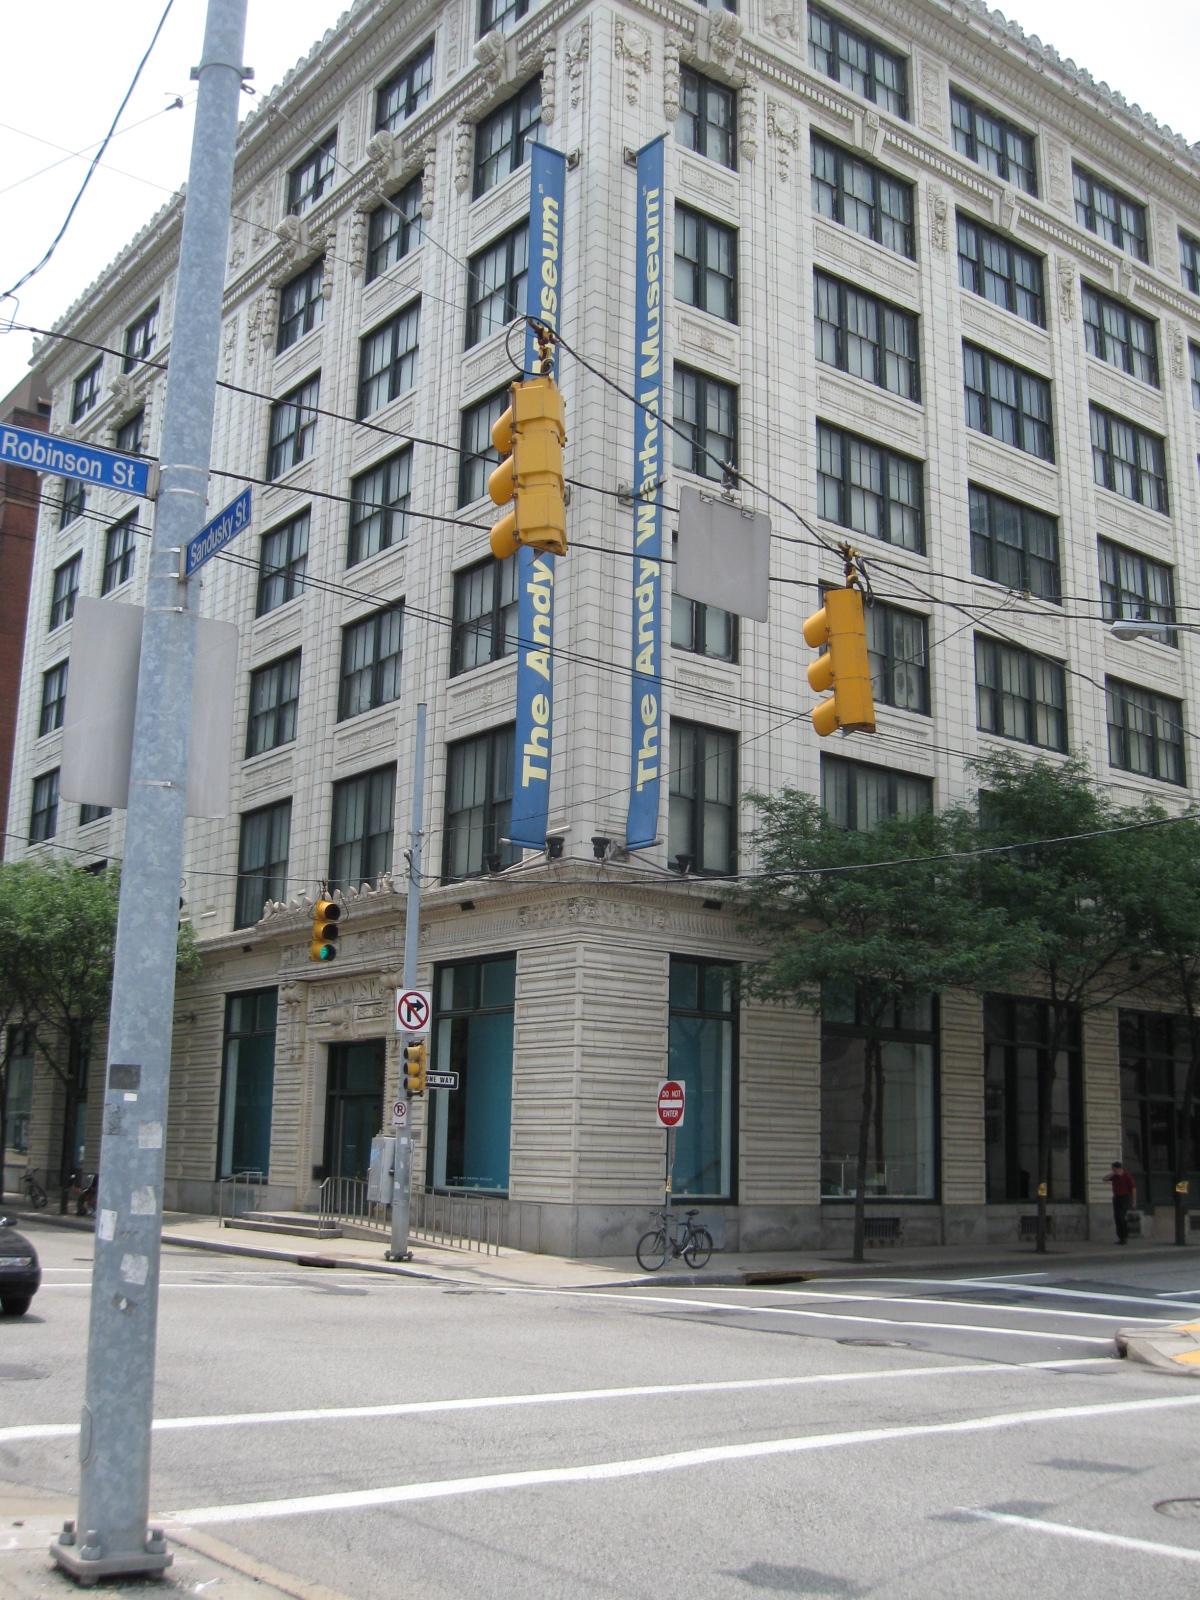 randuwa: The Andy Warhol Museum